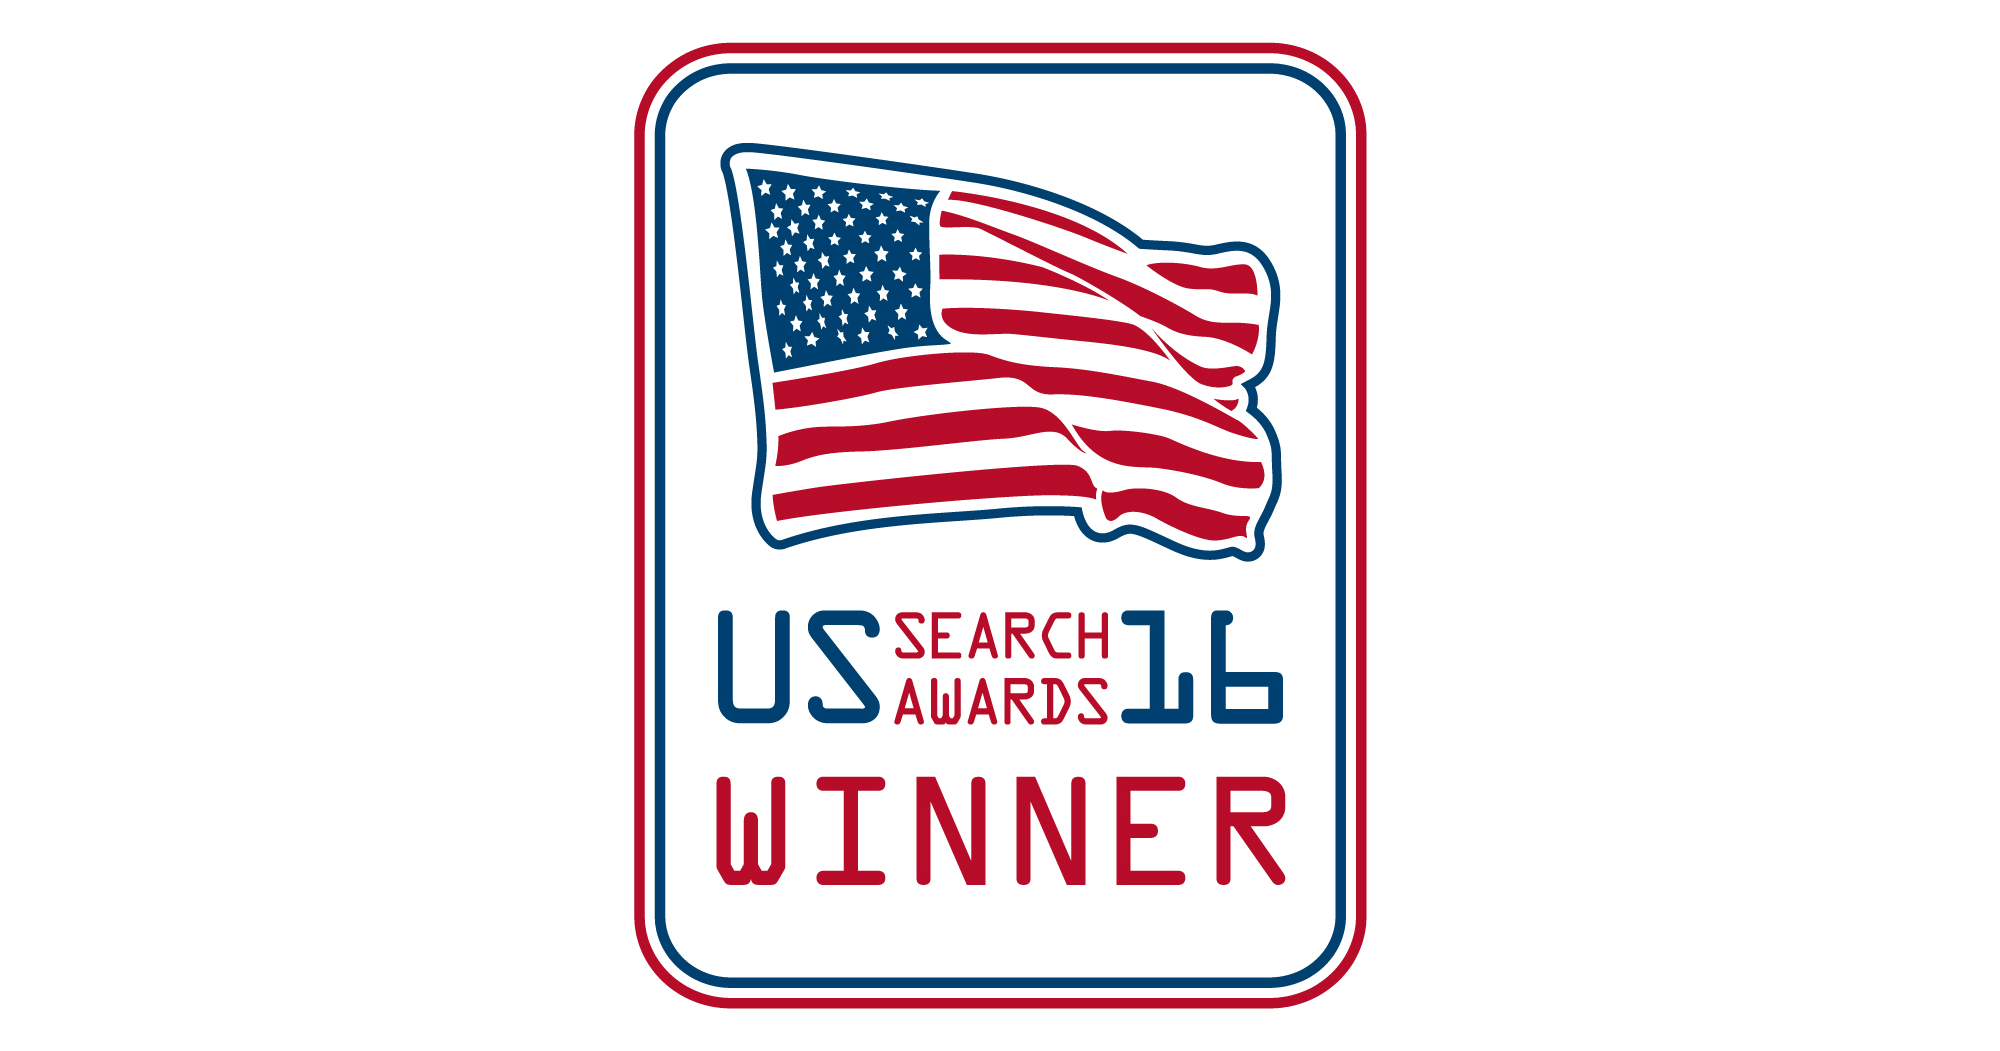 Botify US Search Awards 2016 Winner